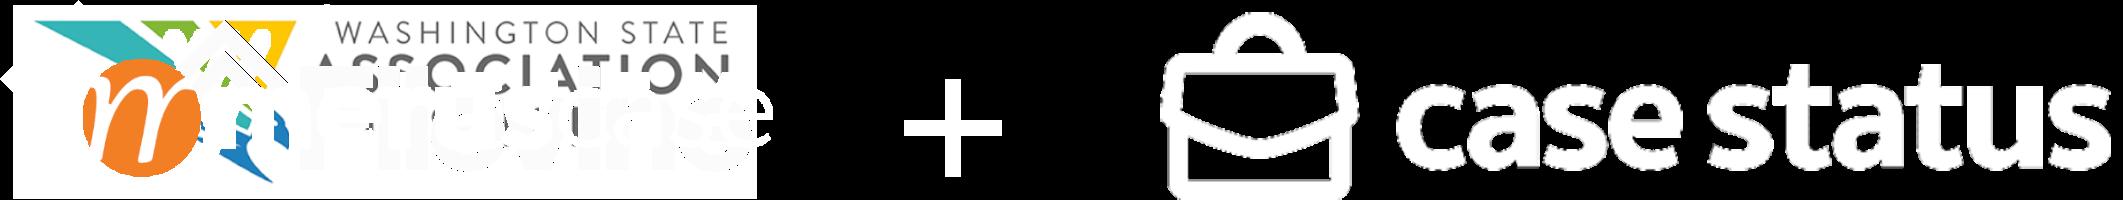 meruscase logo casestatus